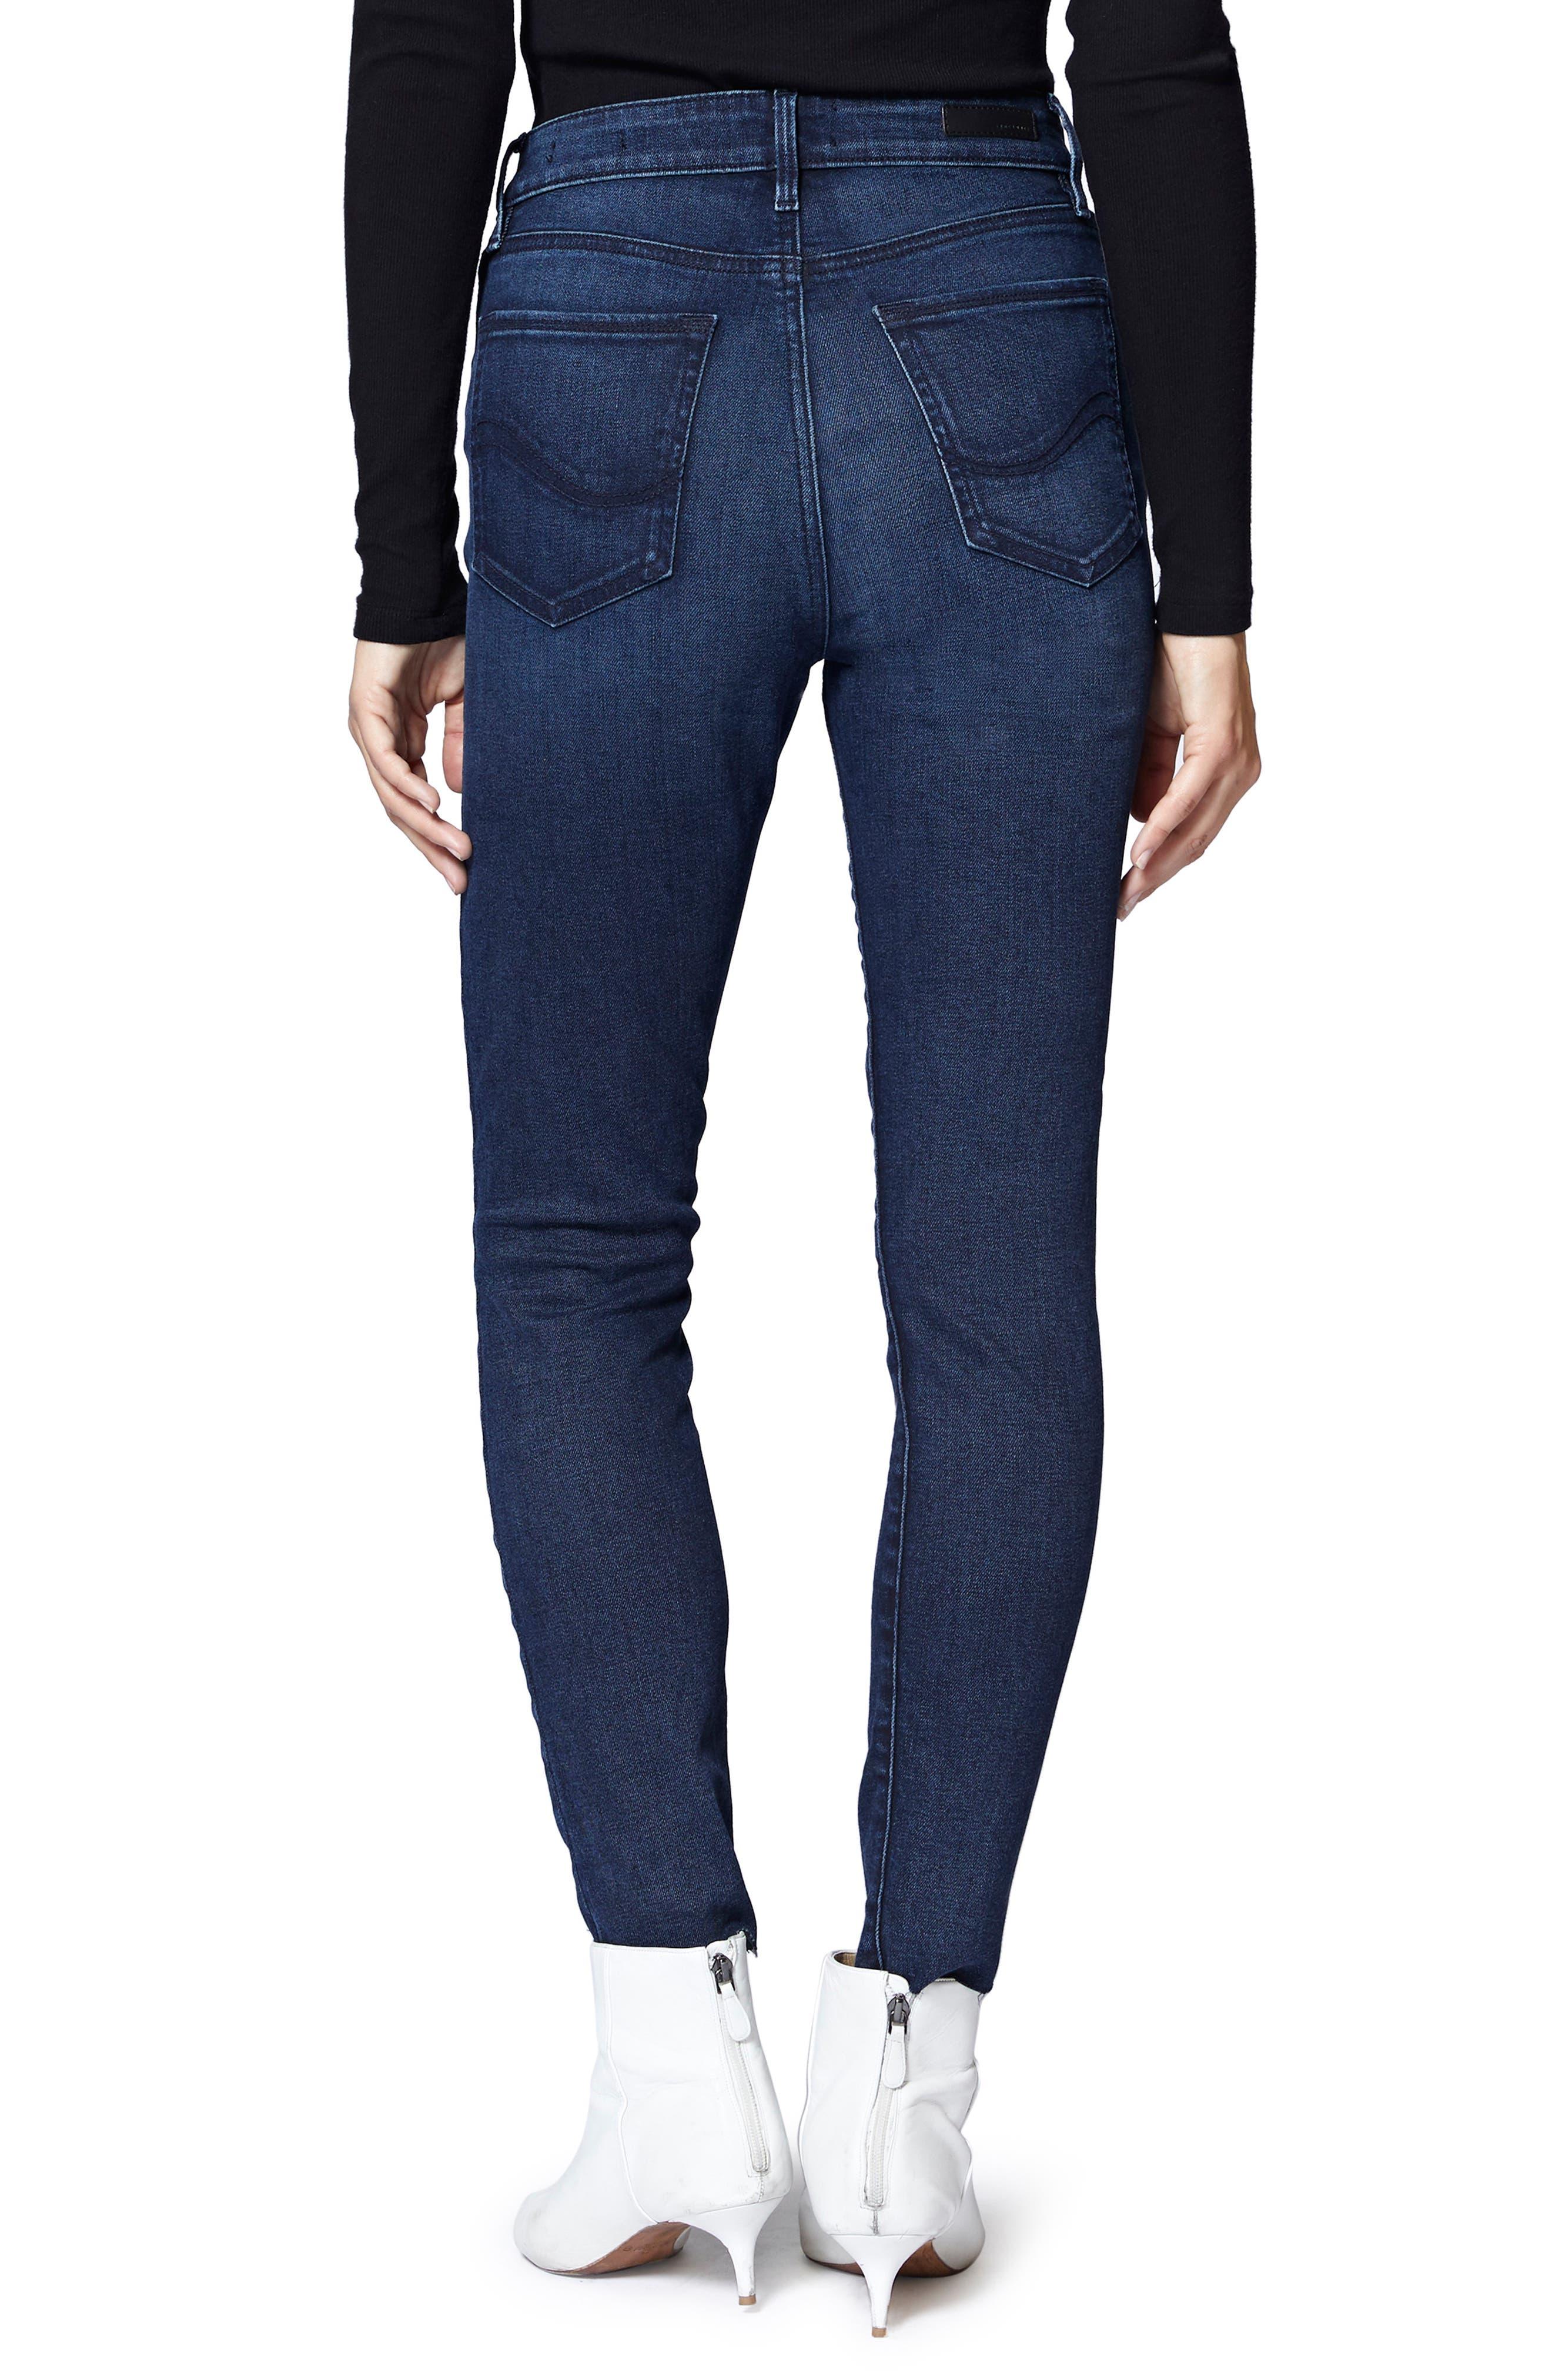 SANCTUARY,                             Social High Rise Raw Hem Skinny Ankle Jeans,                             Alternate thumbnail 2, color,                             401